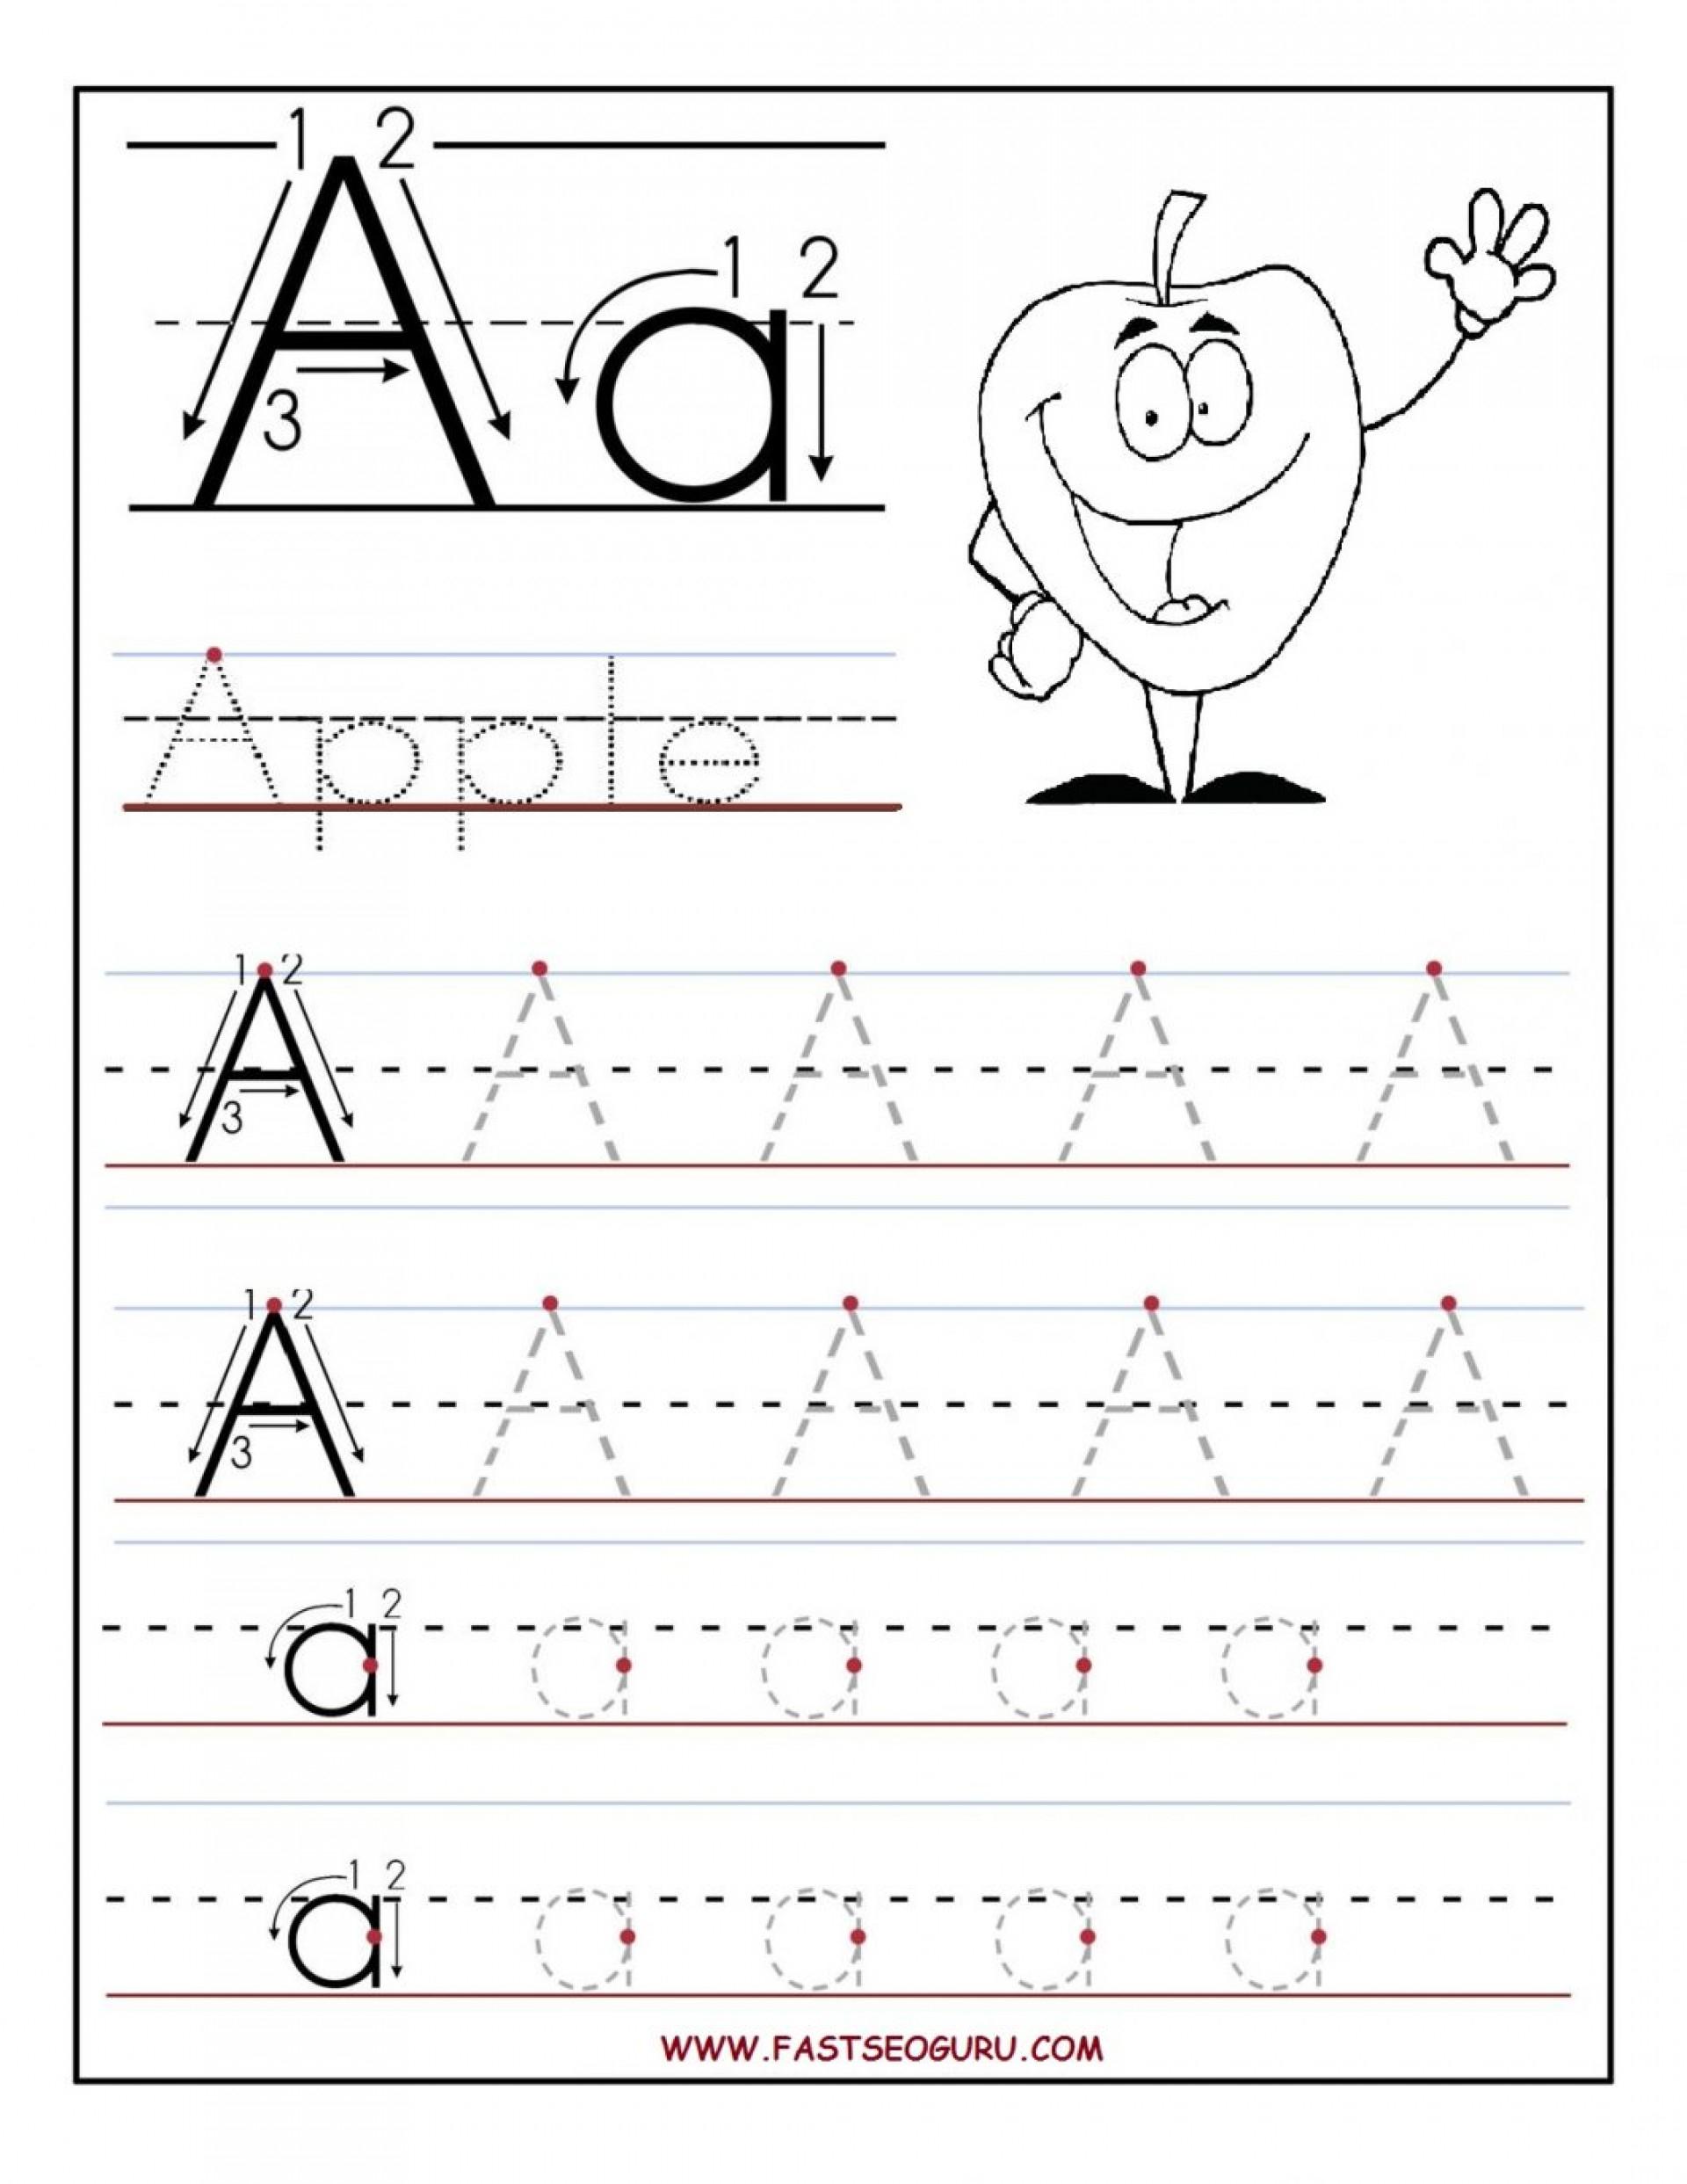 Worksheet Trace Letters Tracing Worksheets For Astounding regarding Letter I Worksheets Free